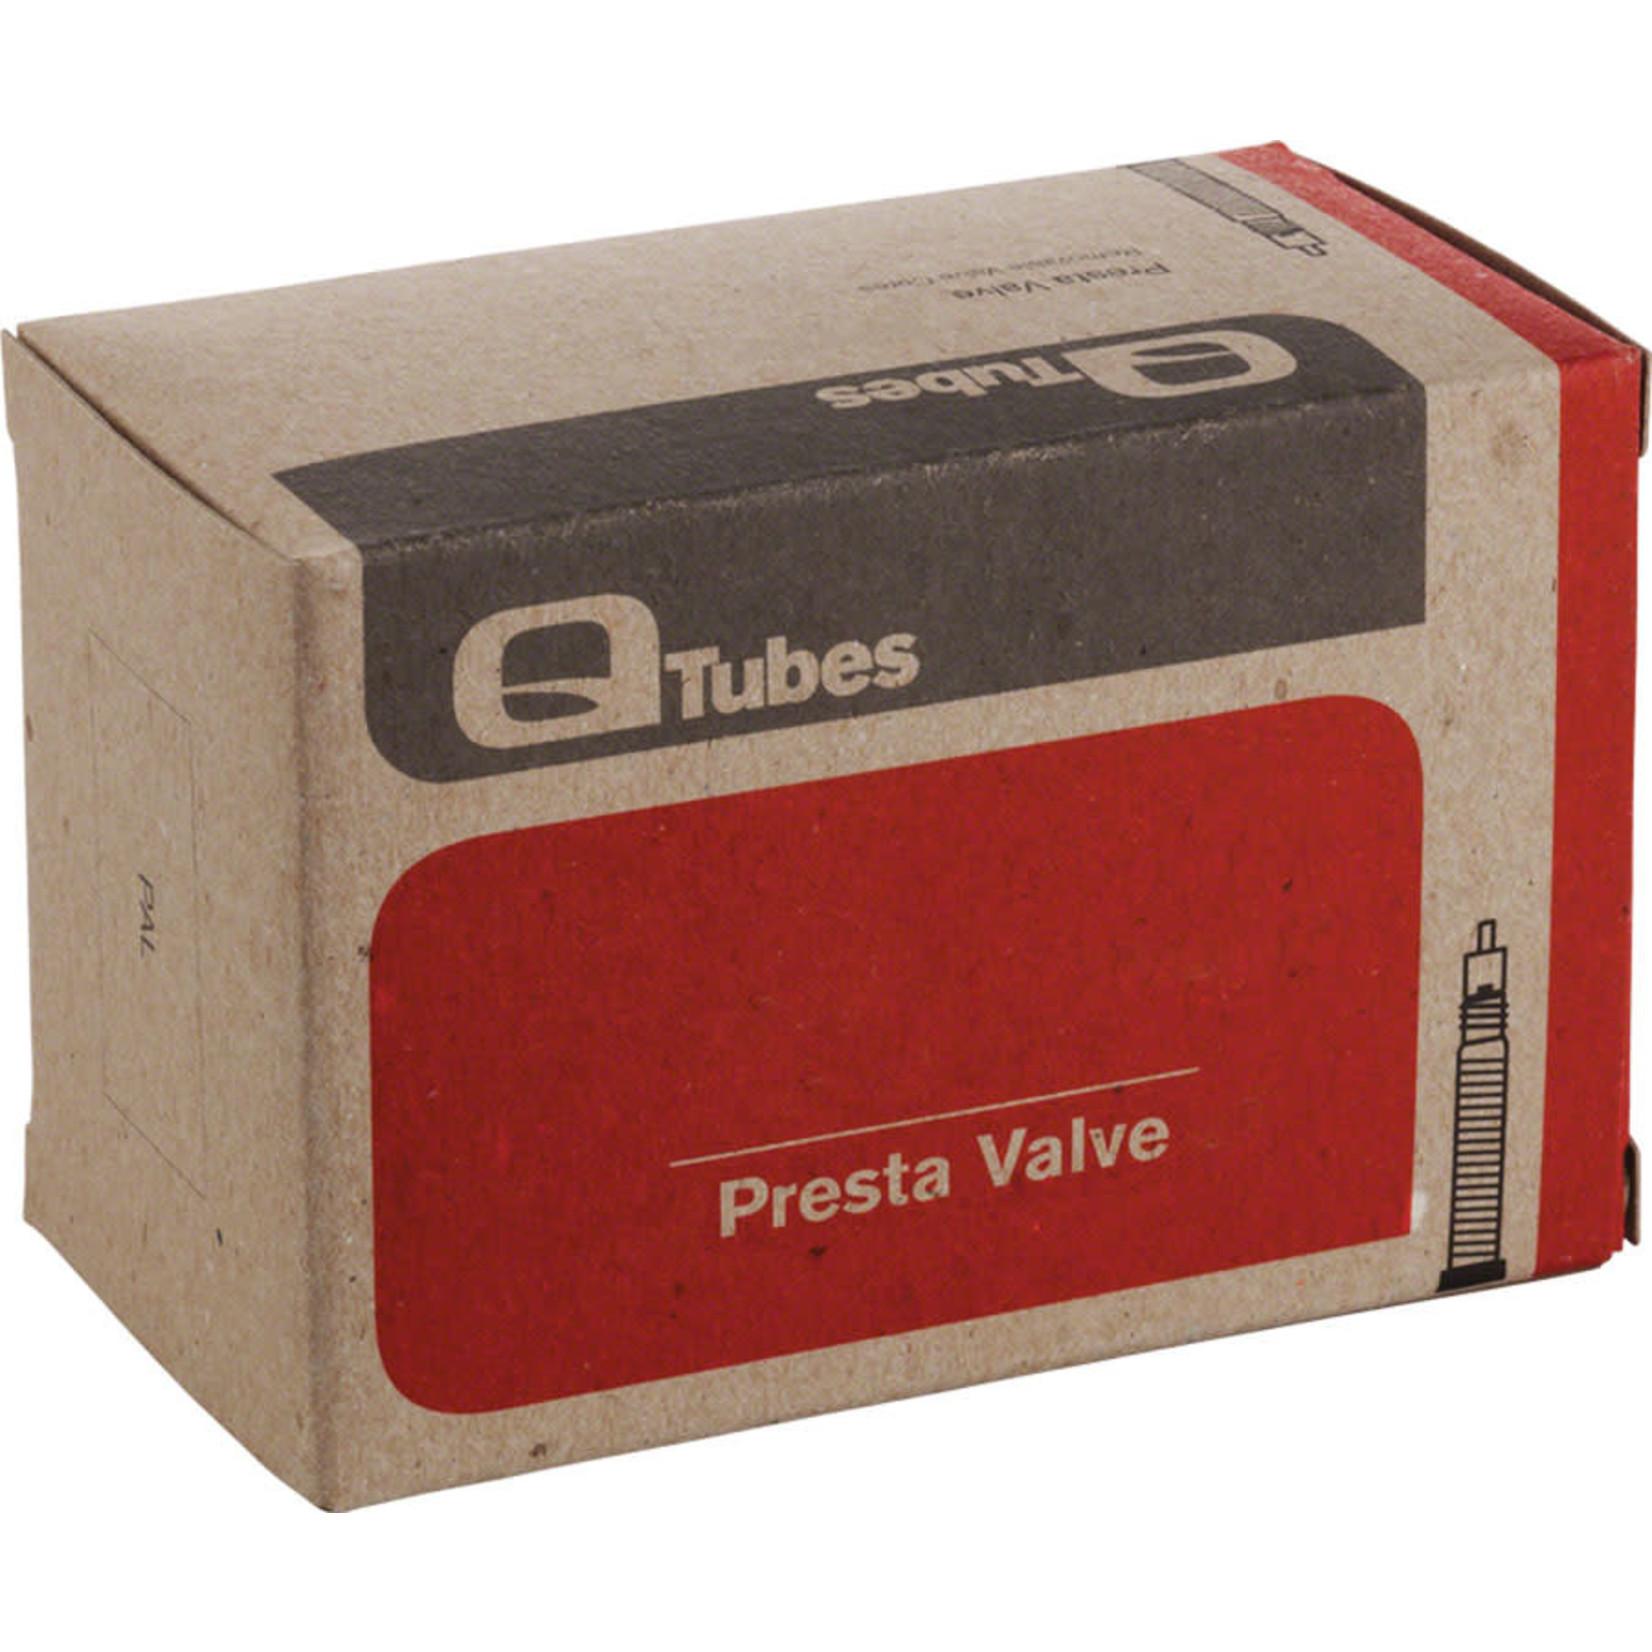 Q-Tubes Q-Tubes 700c x 18-23mm 60mm Presta Valve Tube 101g